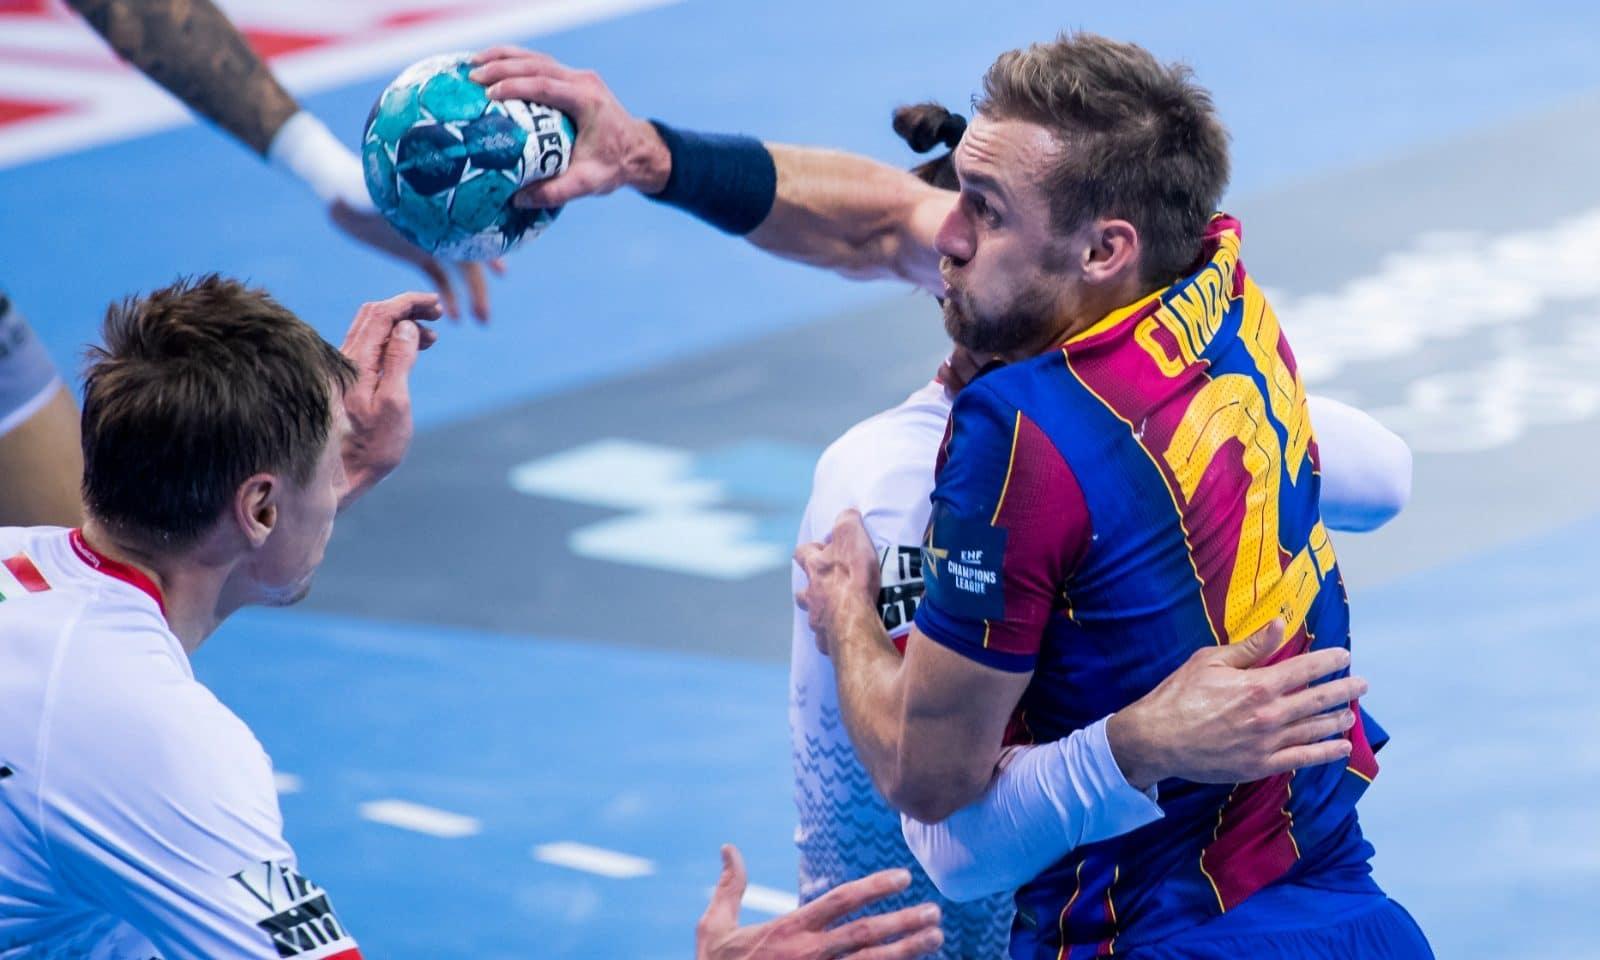 Barcelona Vezprém Champions League handebol masculino Luka Cindric